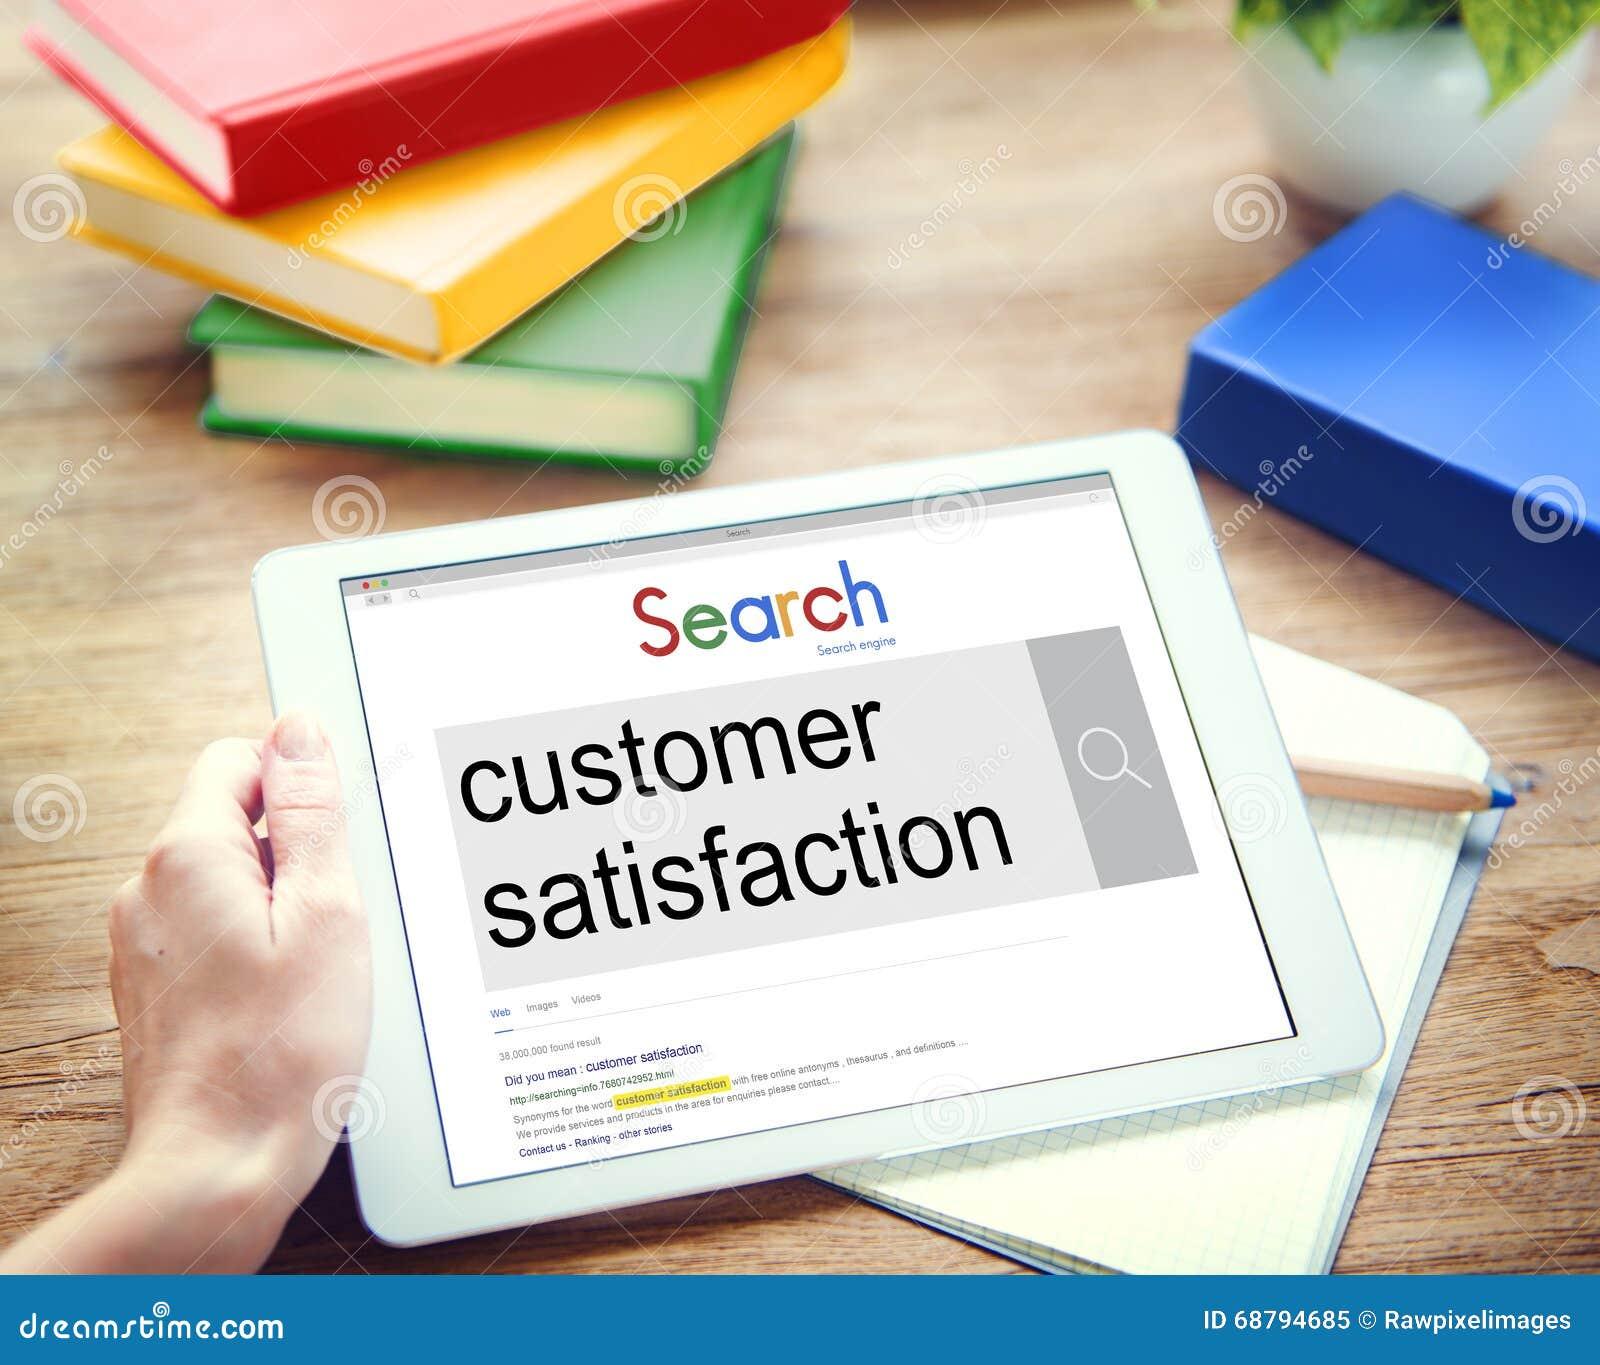 Customer Satisfaction Services Satisfied Concept